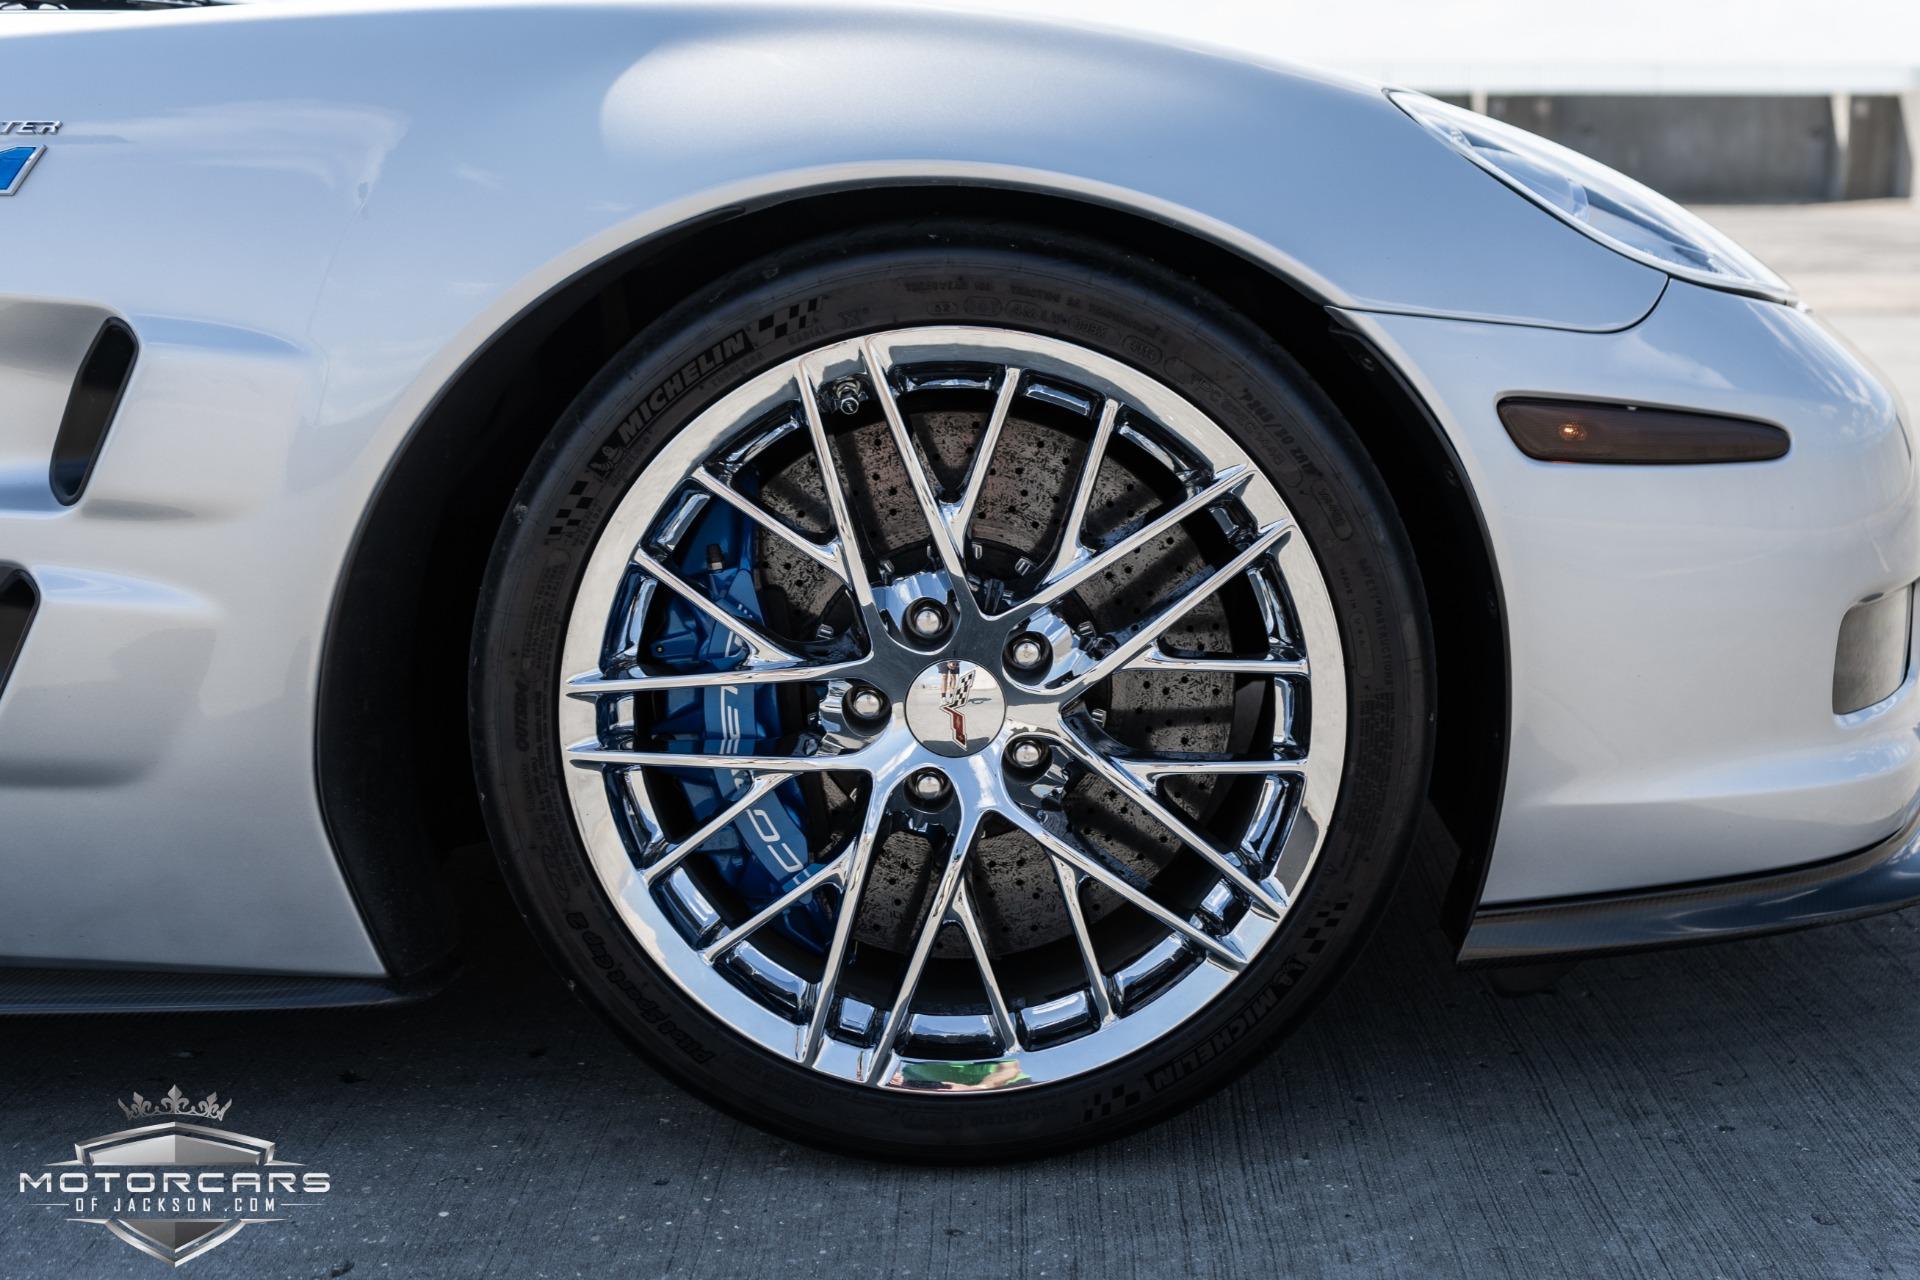 Used-2010-Chevrolet-Corvette-ZR1-w/3ZR-Lingenfelter-for-sale-Jackson-MS